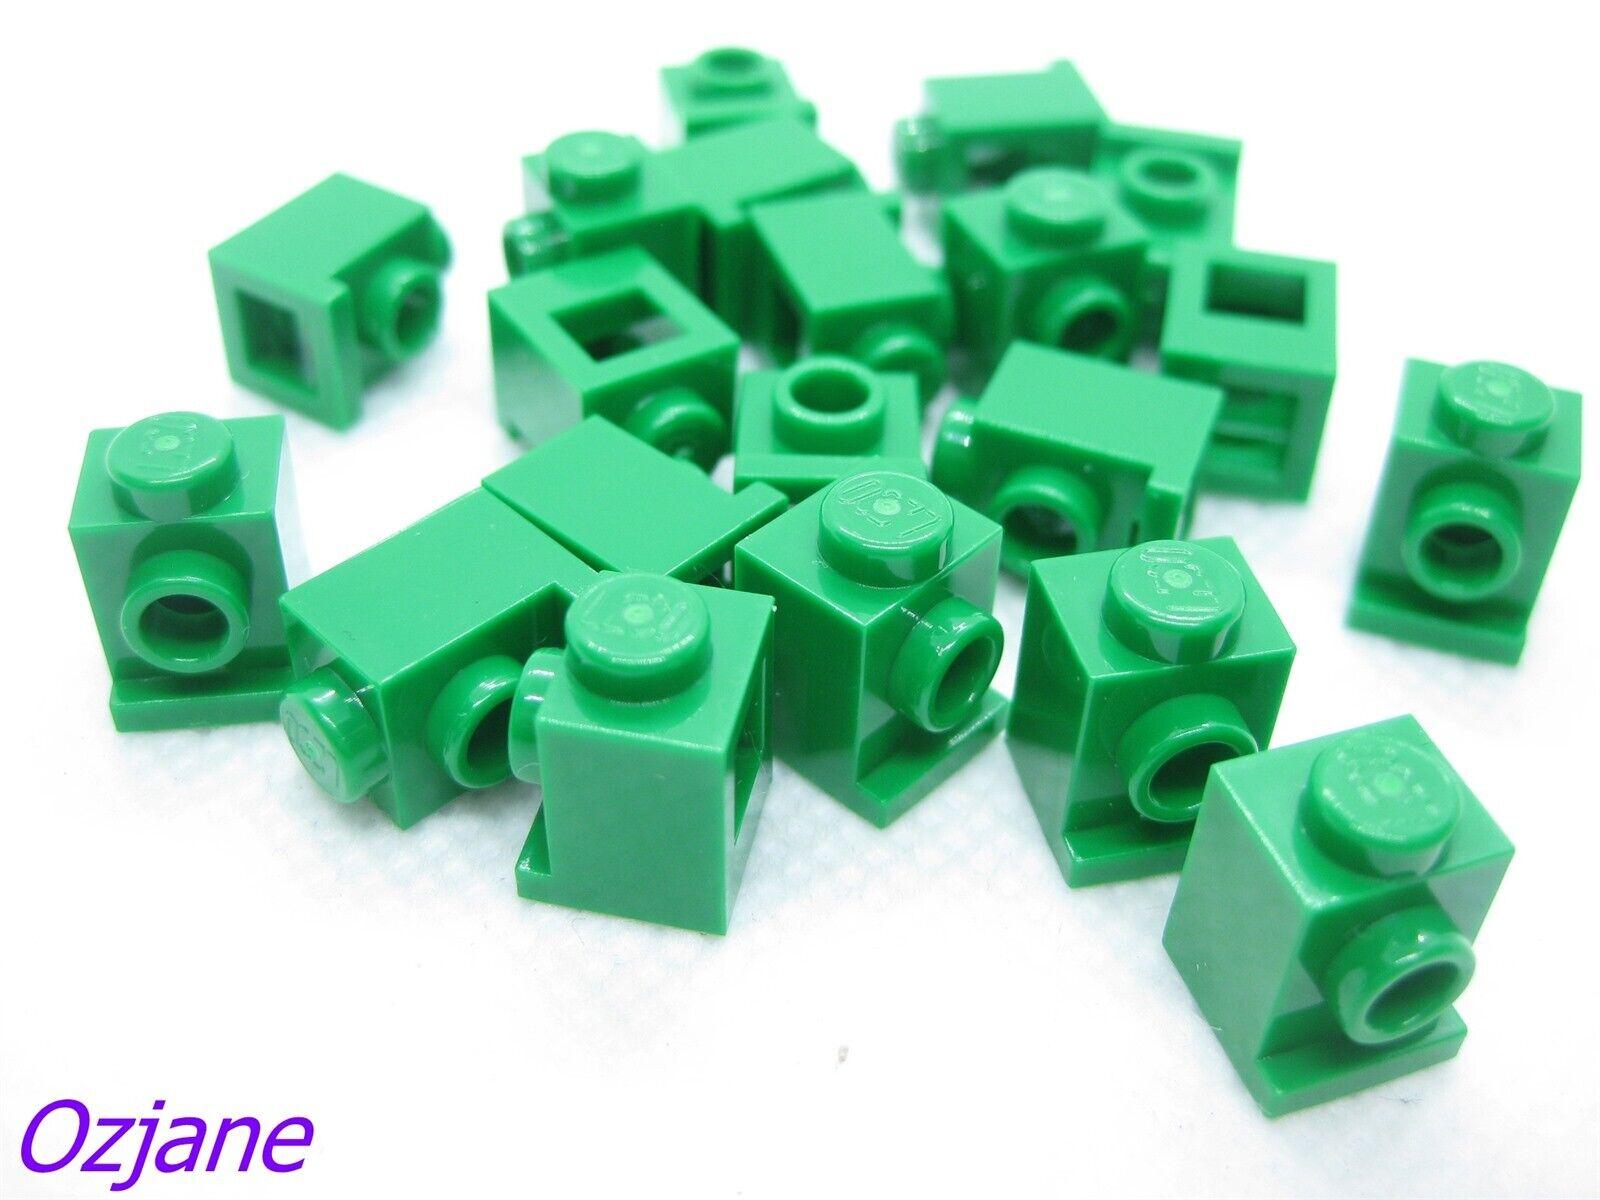 Lego 5 New White Bricks Modified 1 x 1 with Headlight Pieces